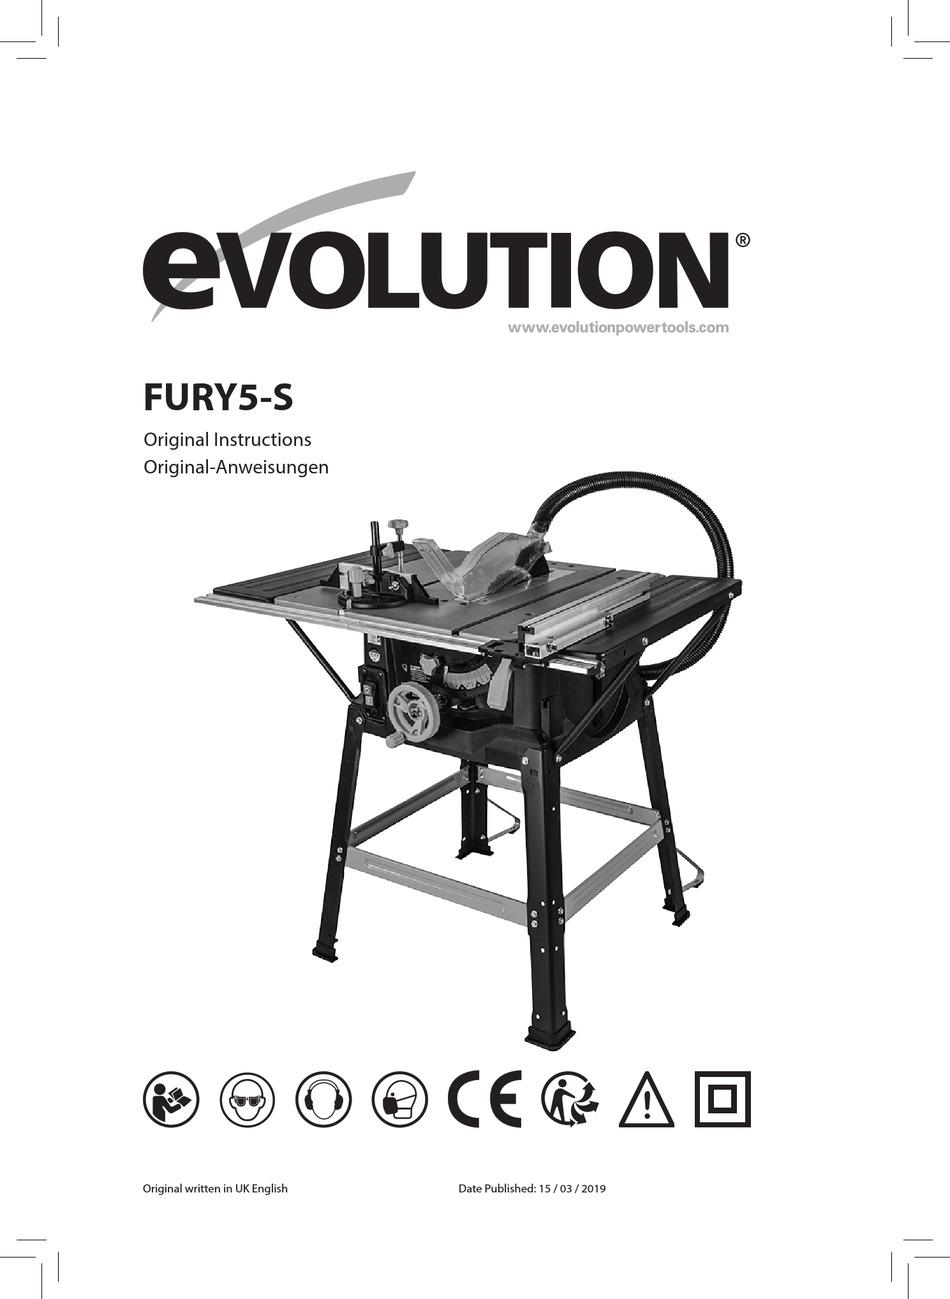 EVOLUTION FURY5-S ORIGINAL INSTRUCTIONS MANUAL Pdf